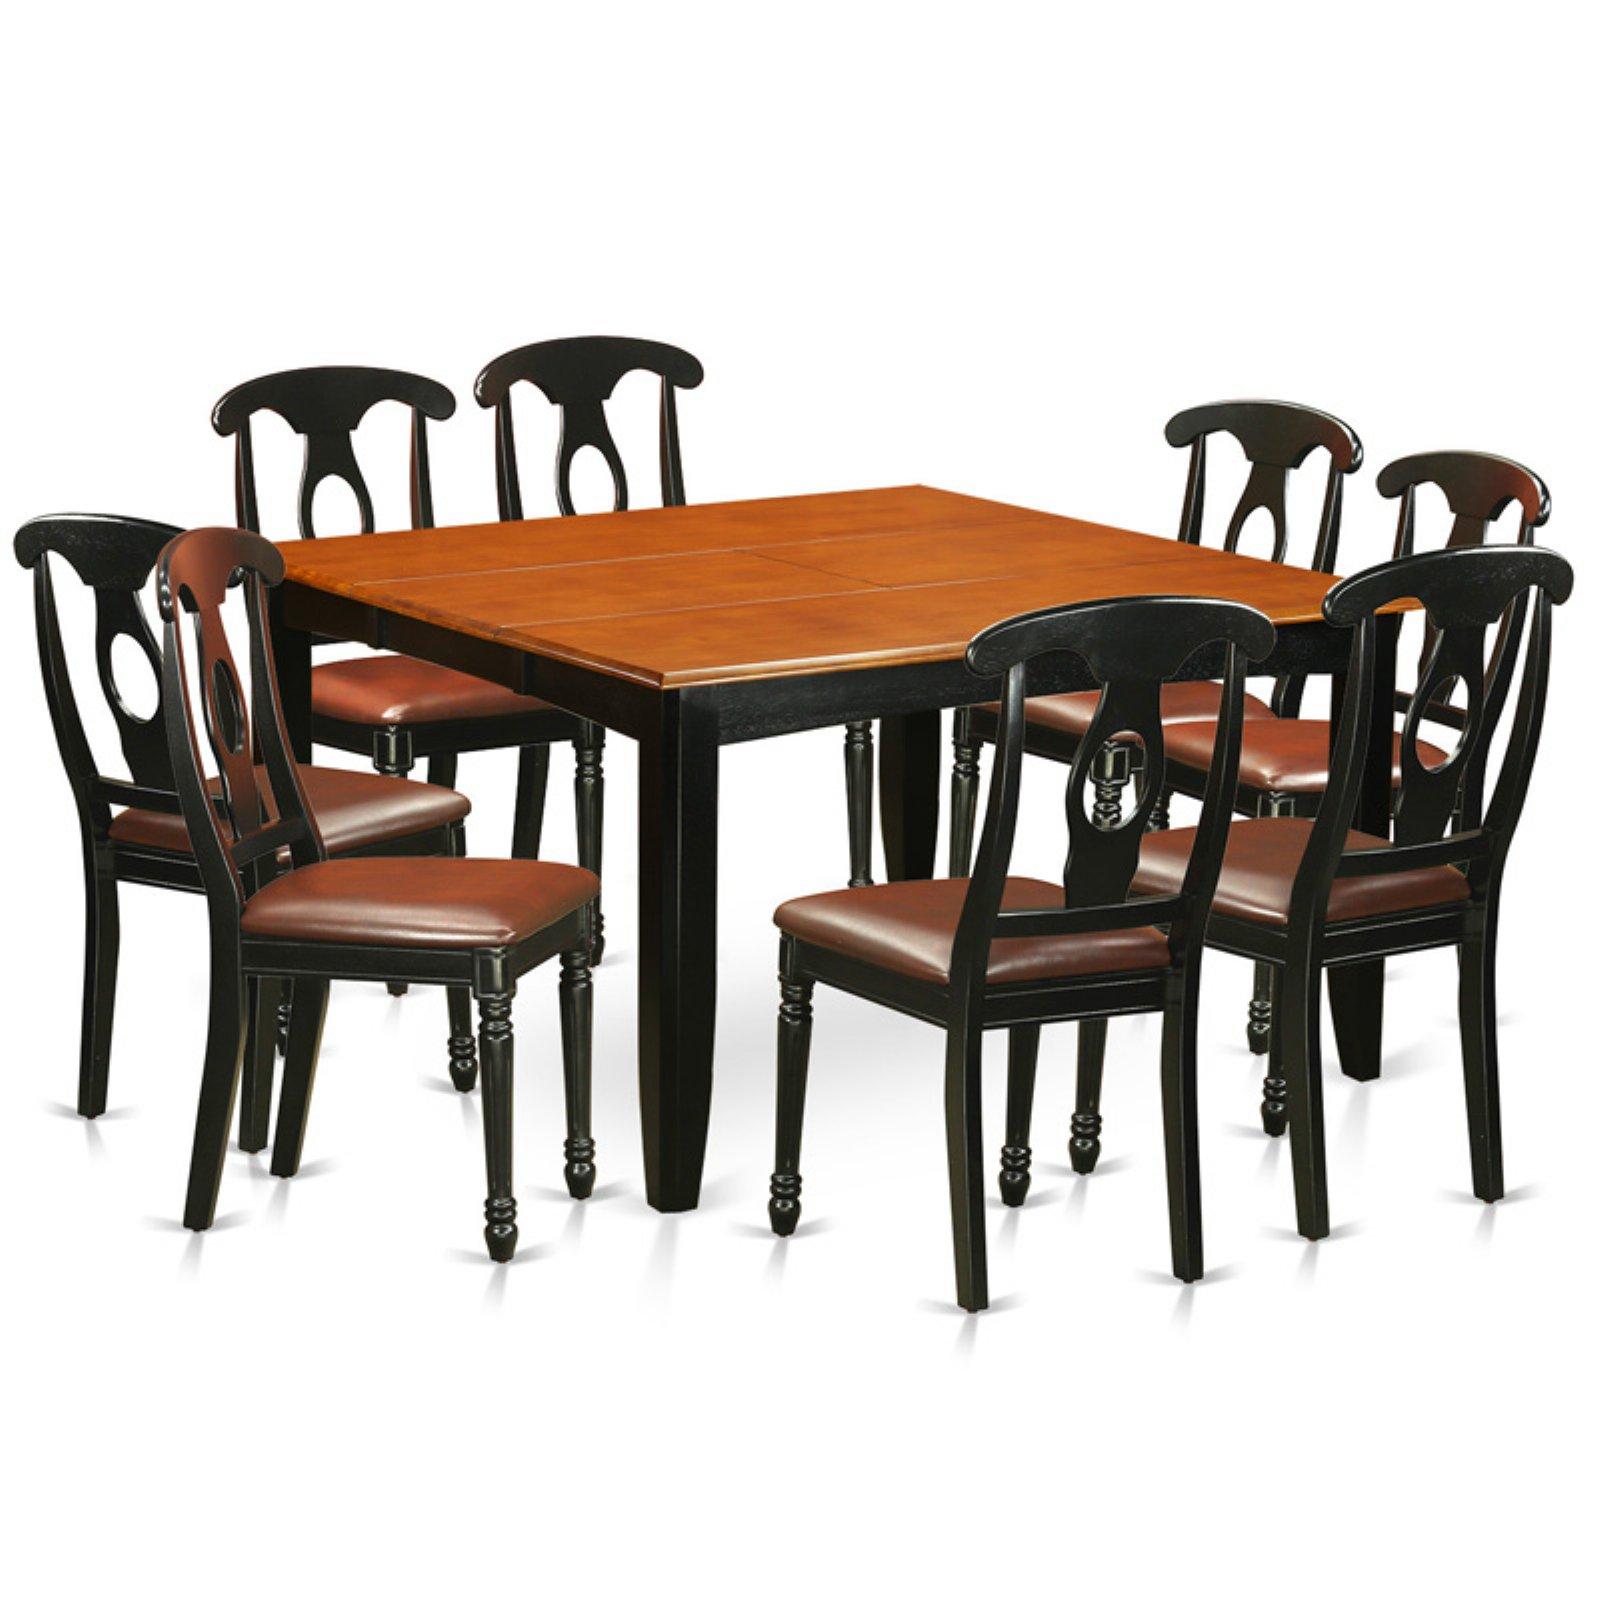 East West Furniture Parfait 9 Piece Keyhole Dining Table Set